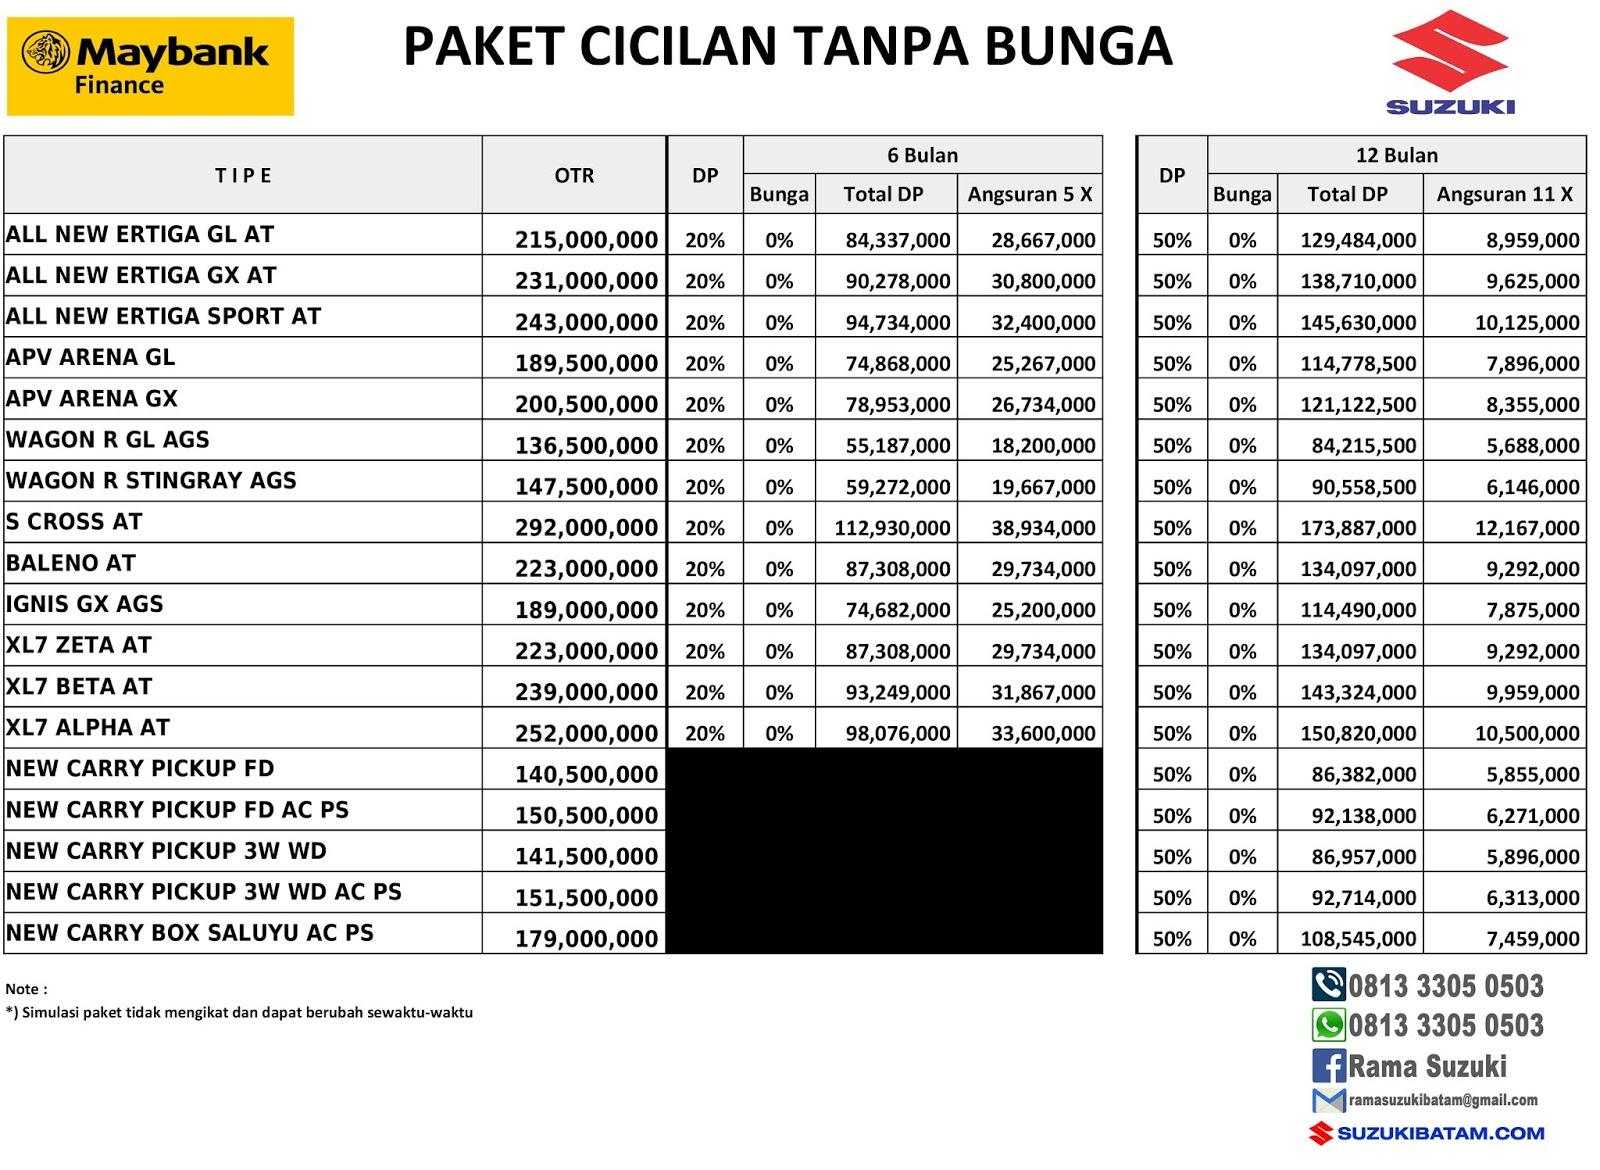 Harga Kredit Cicilan Tanpa Bunga Mobil Suzuki Batam Mei 2020 Mybank Dealer Resmi Mobil Suzuki Batam